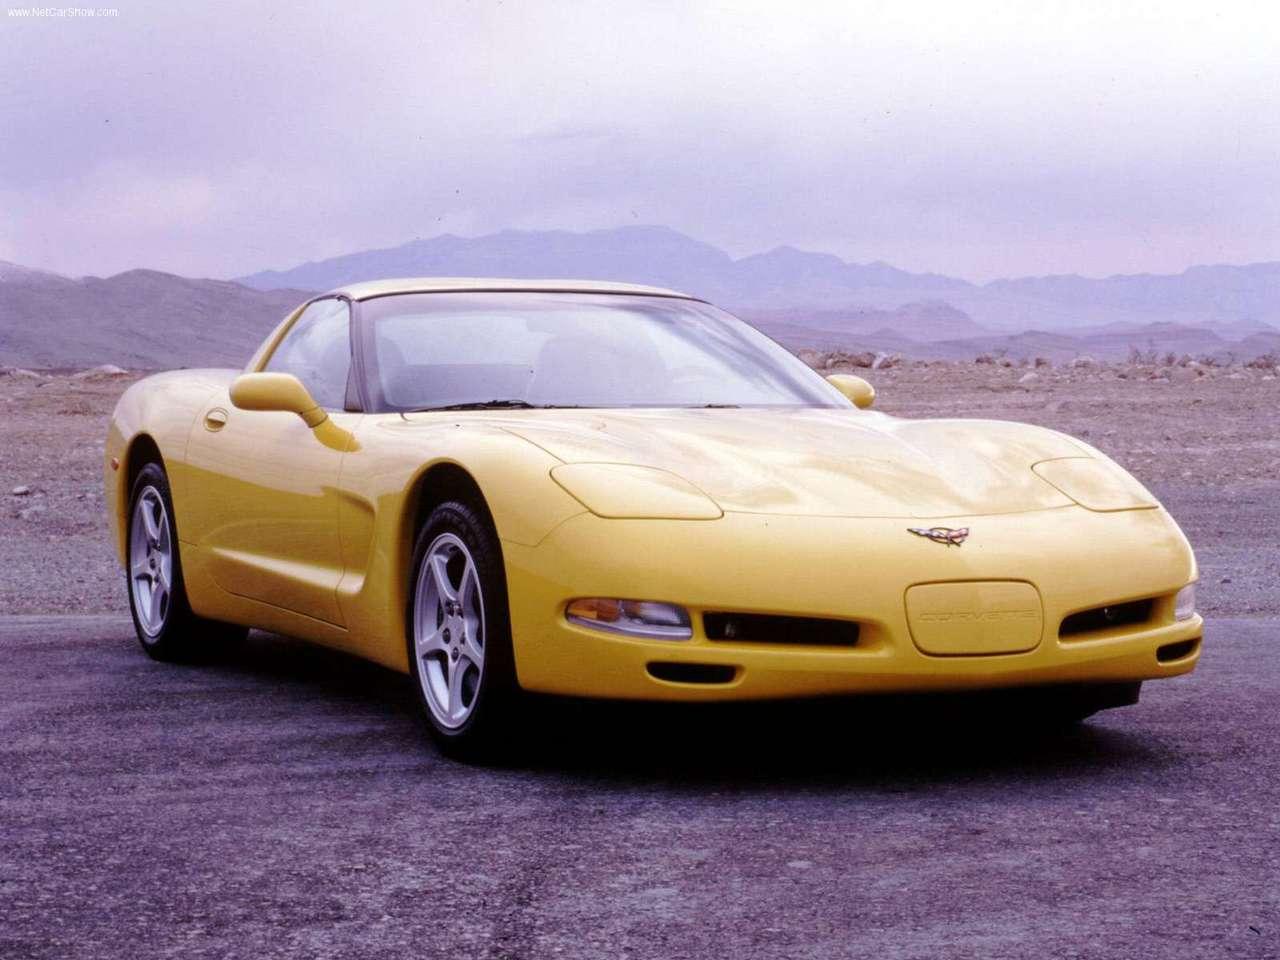 http://4.bp.blogspot.com/-8r7Vi_XsbIg/TZBWBbEIAlI/AAAAAAAAOKY/YoJ3aKWhhfY/s1600/Chevrolet-Corvette_2000_1280x960_wallpaper_02.jpg